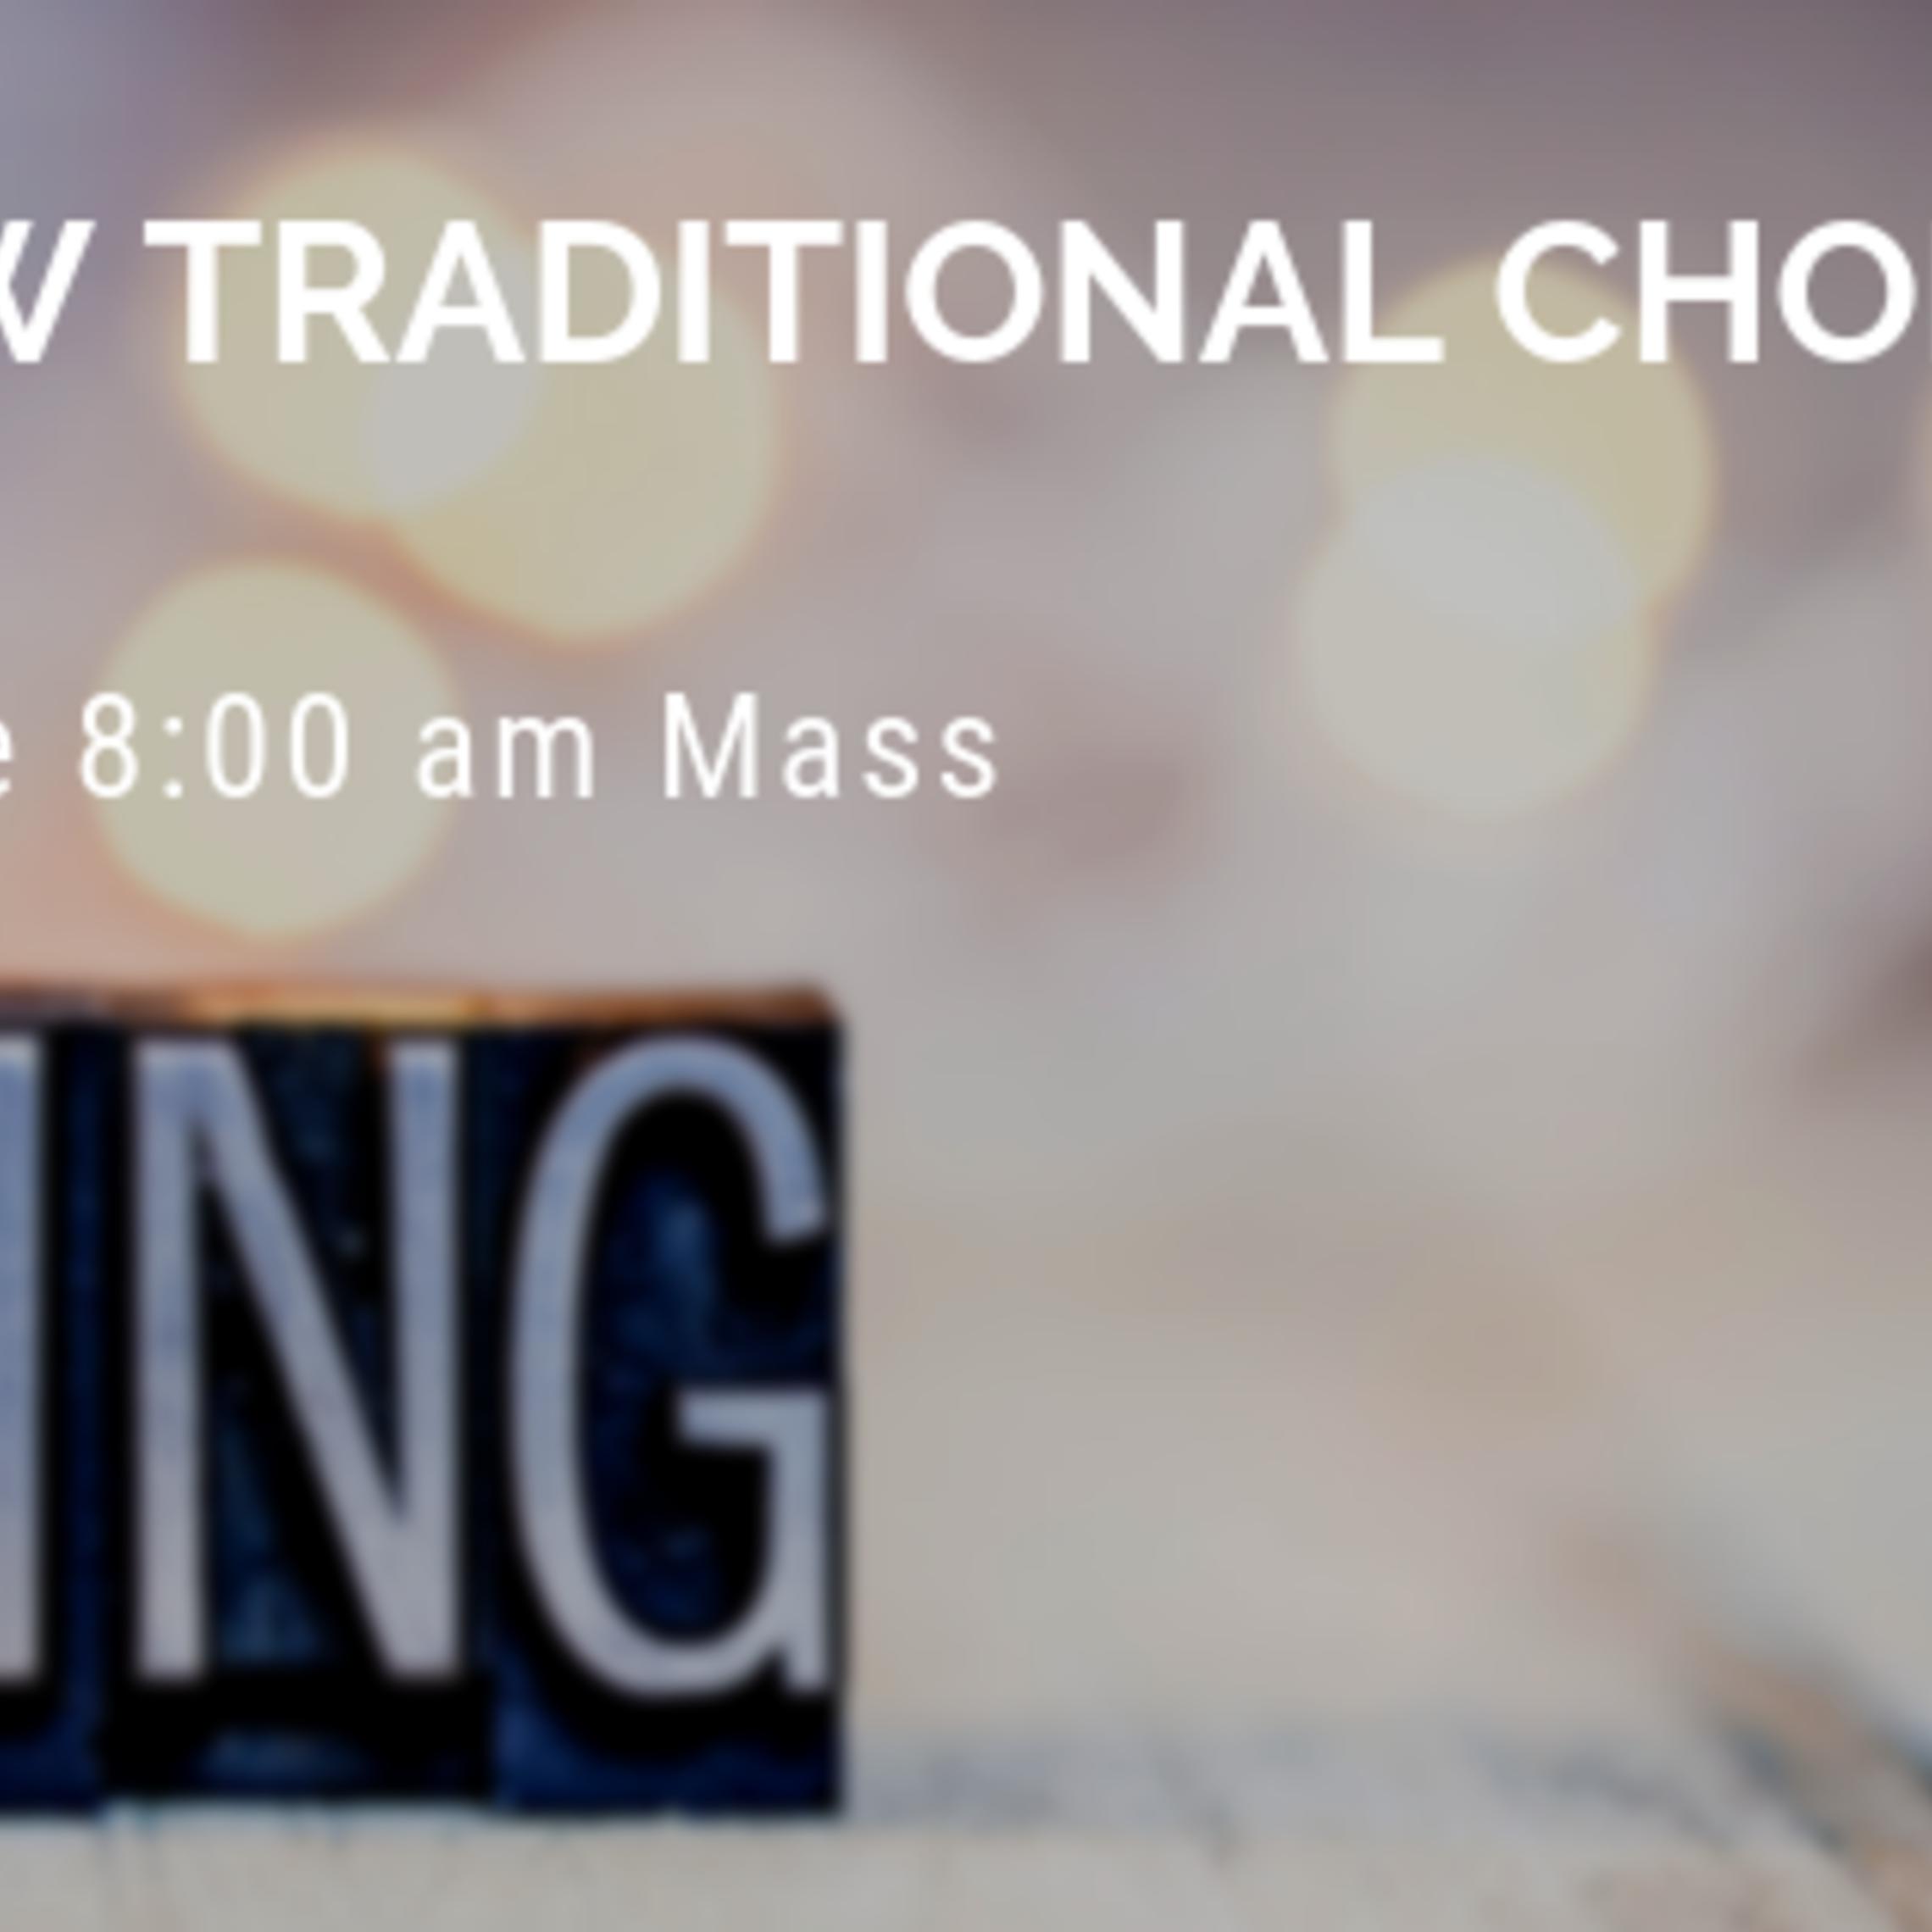 New Traditional Choir